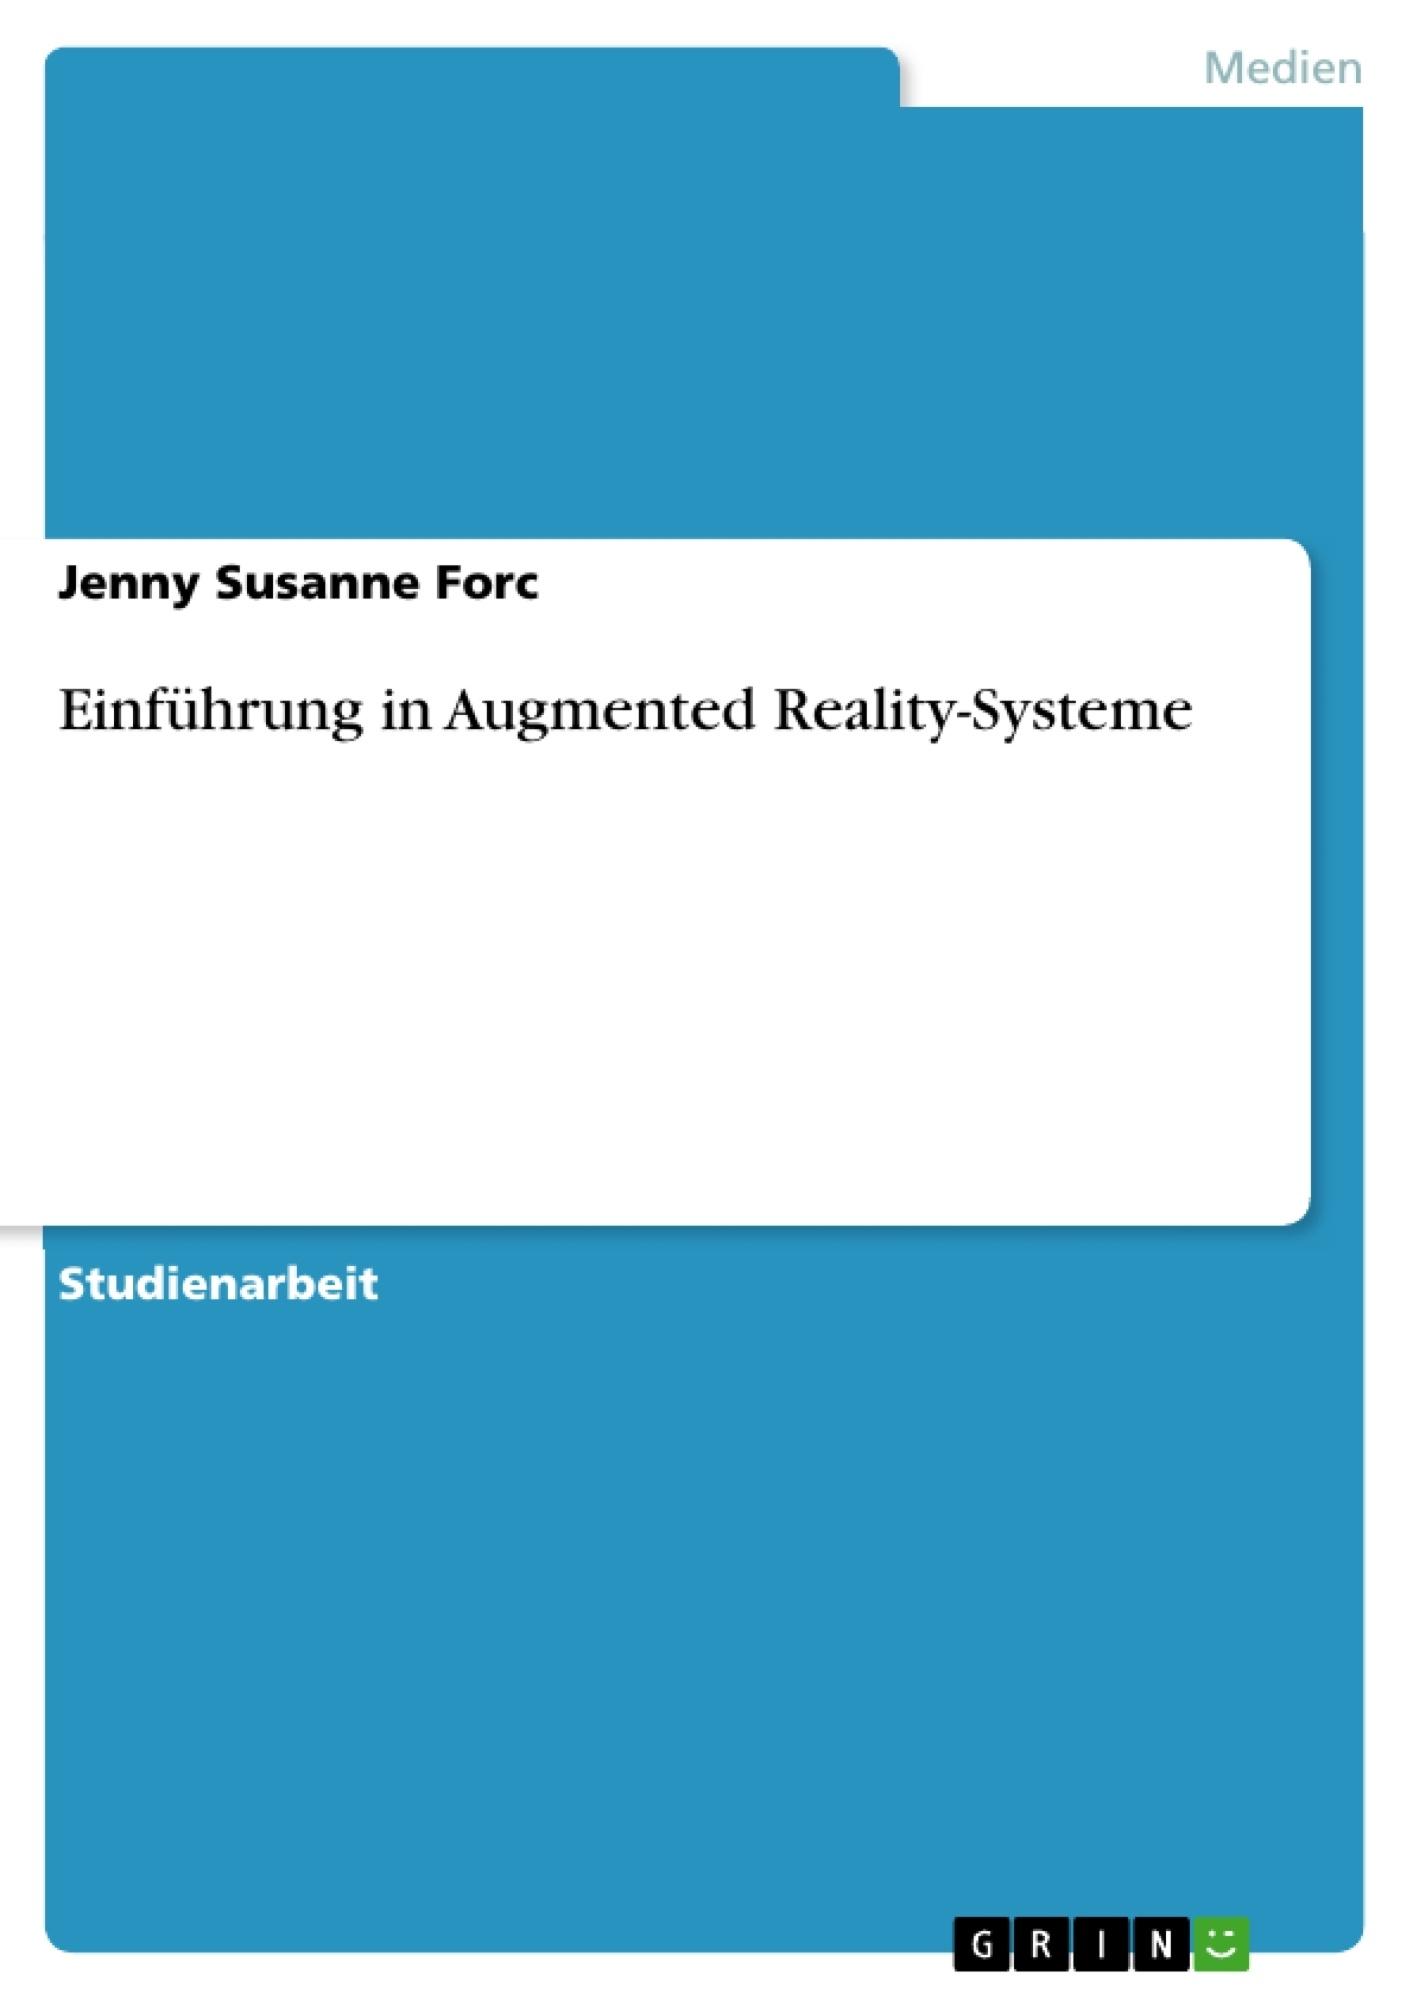 Titel: Einführung in Augmented Reality-Systeme